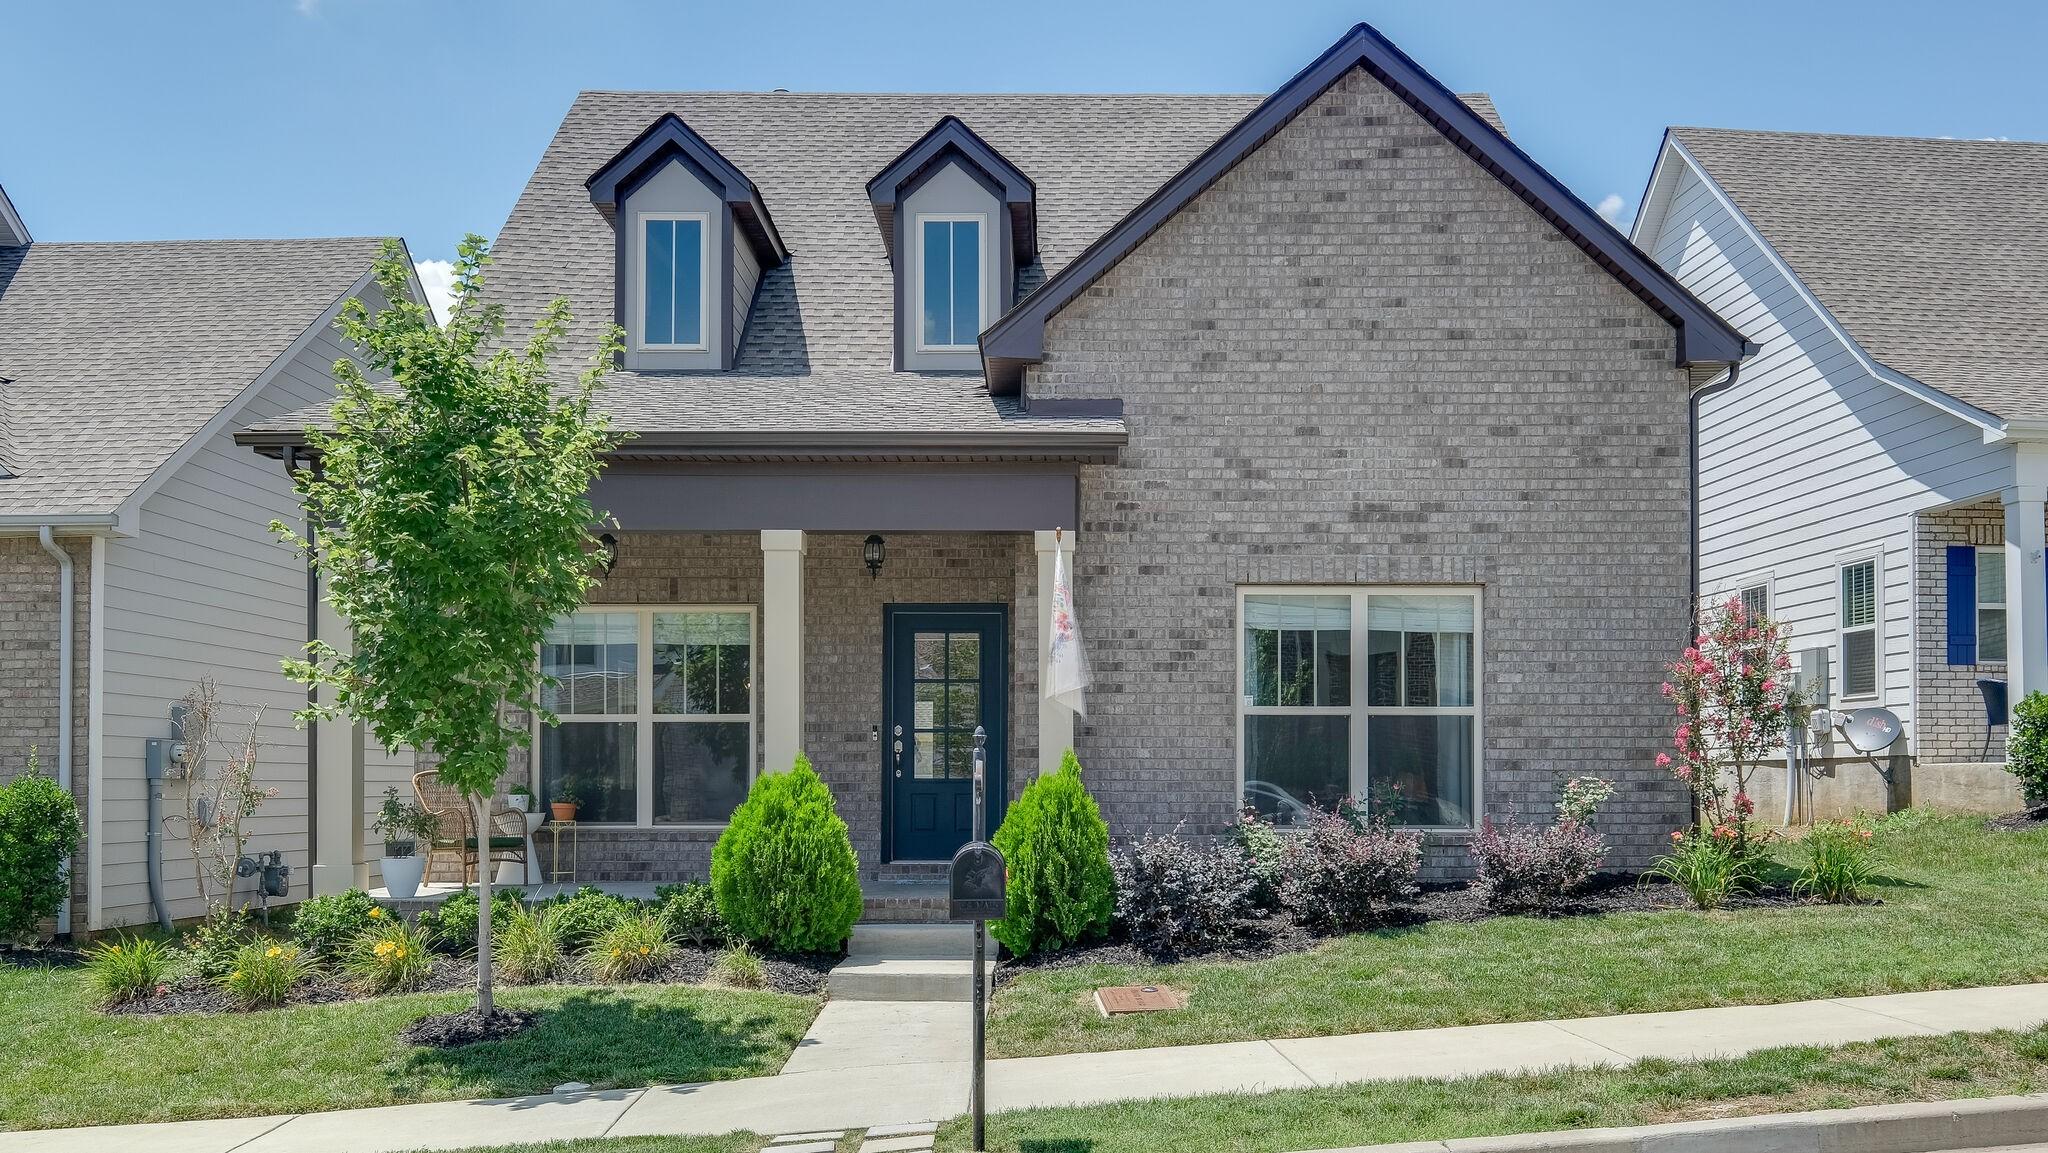 4044 Liberton Way Property Photo - Nolensville, TN real estate listing